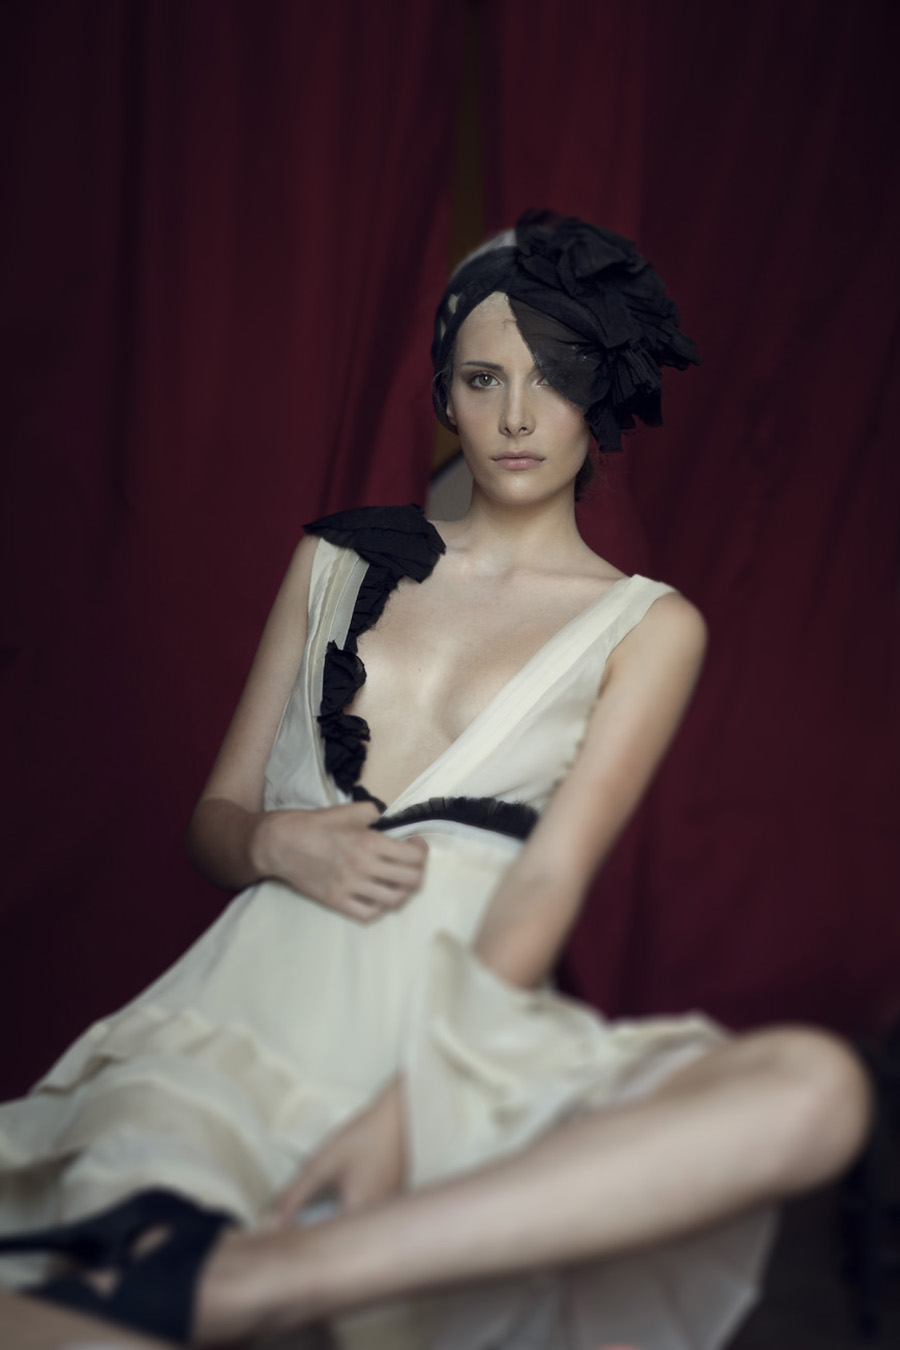 Mayela-Vazquez-Make-Up-and-Hair-Editorial-3.jpg